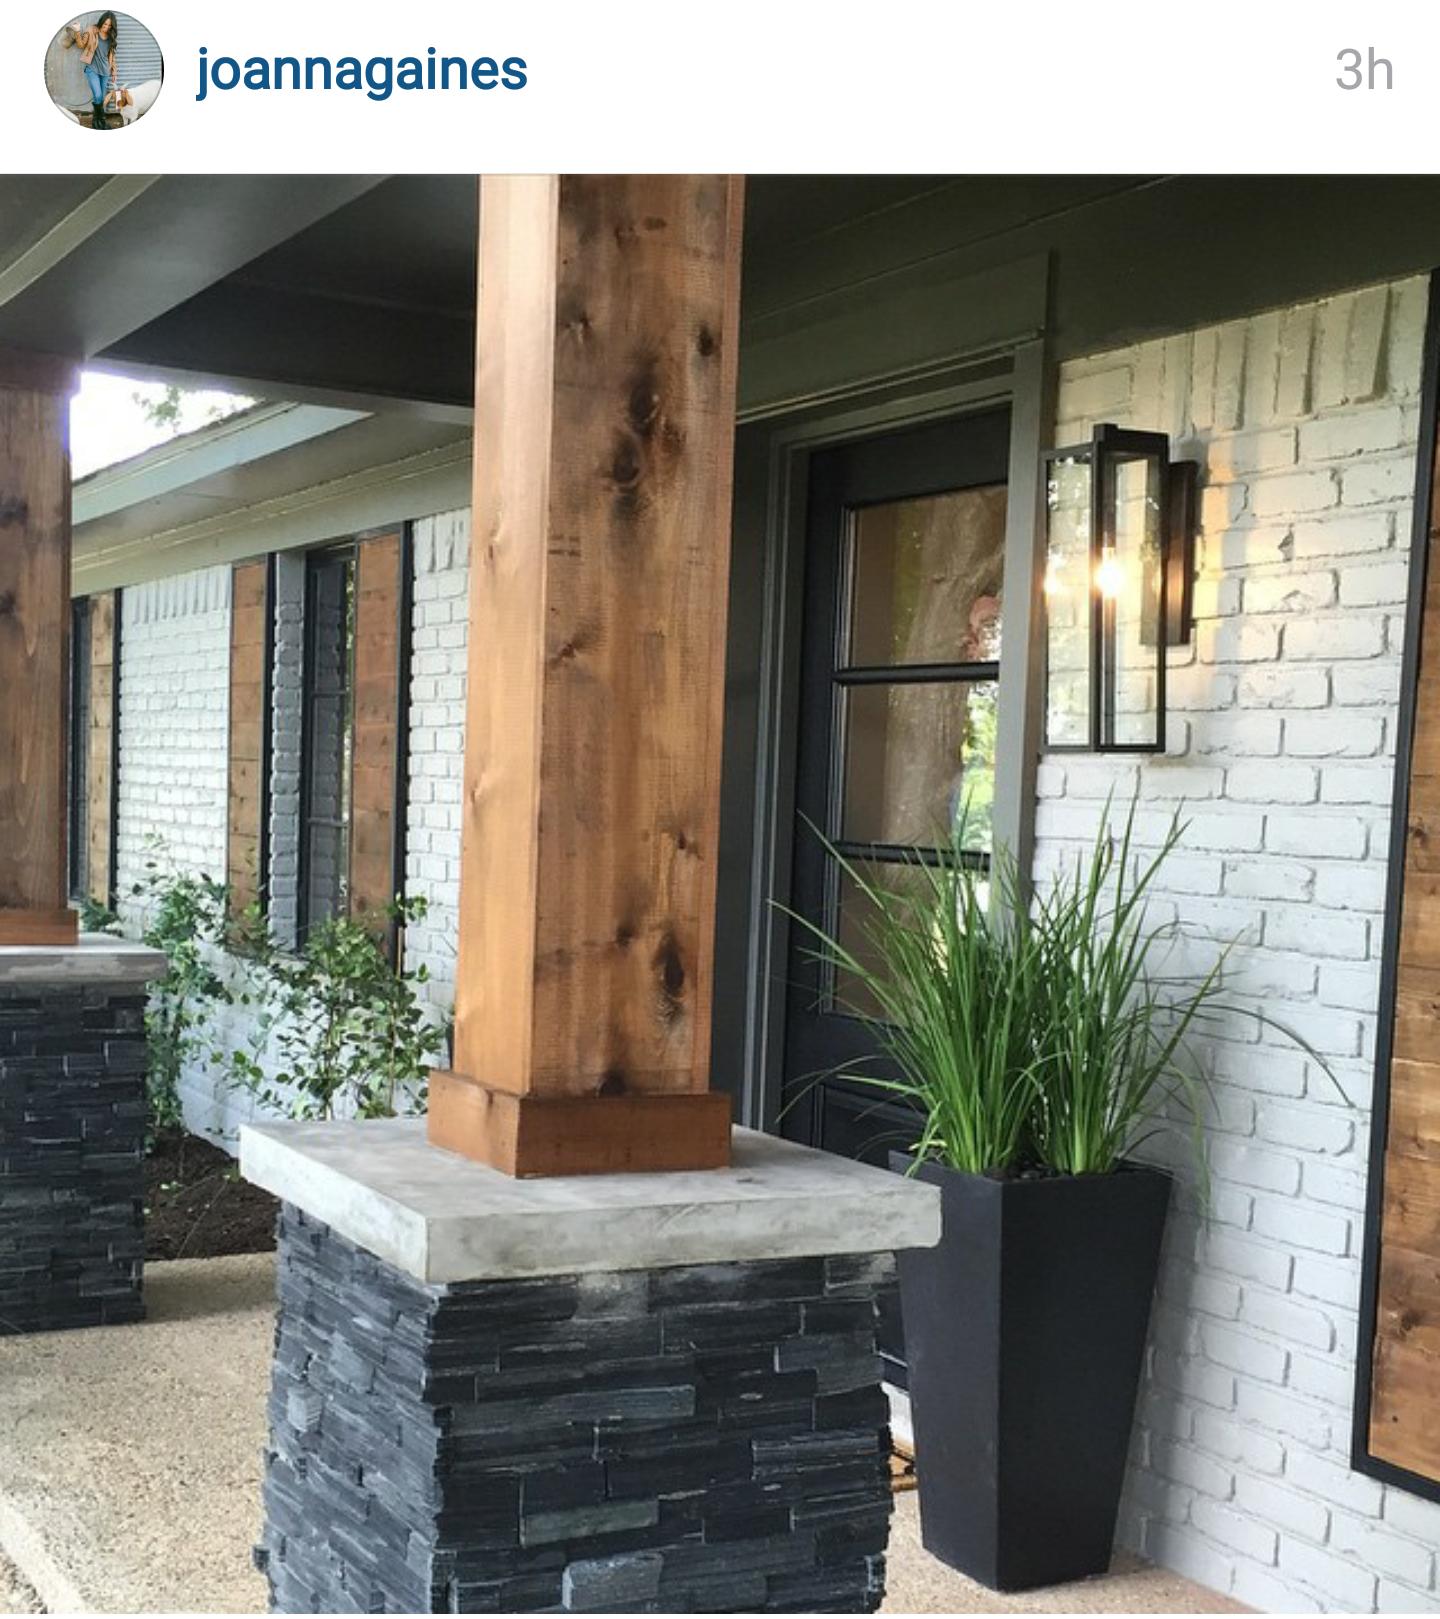 Joanna gaines hallway ideas  Joanna gaines on instagram  Corbels porches beams  Pinterest